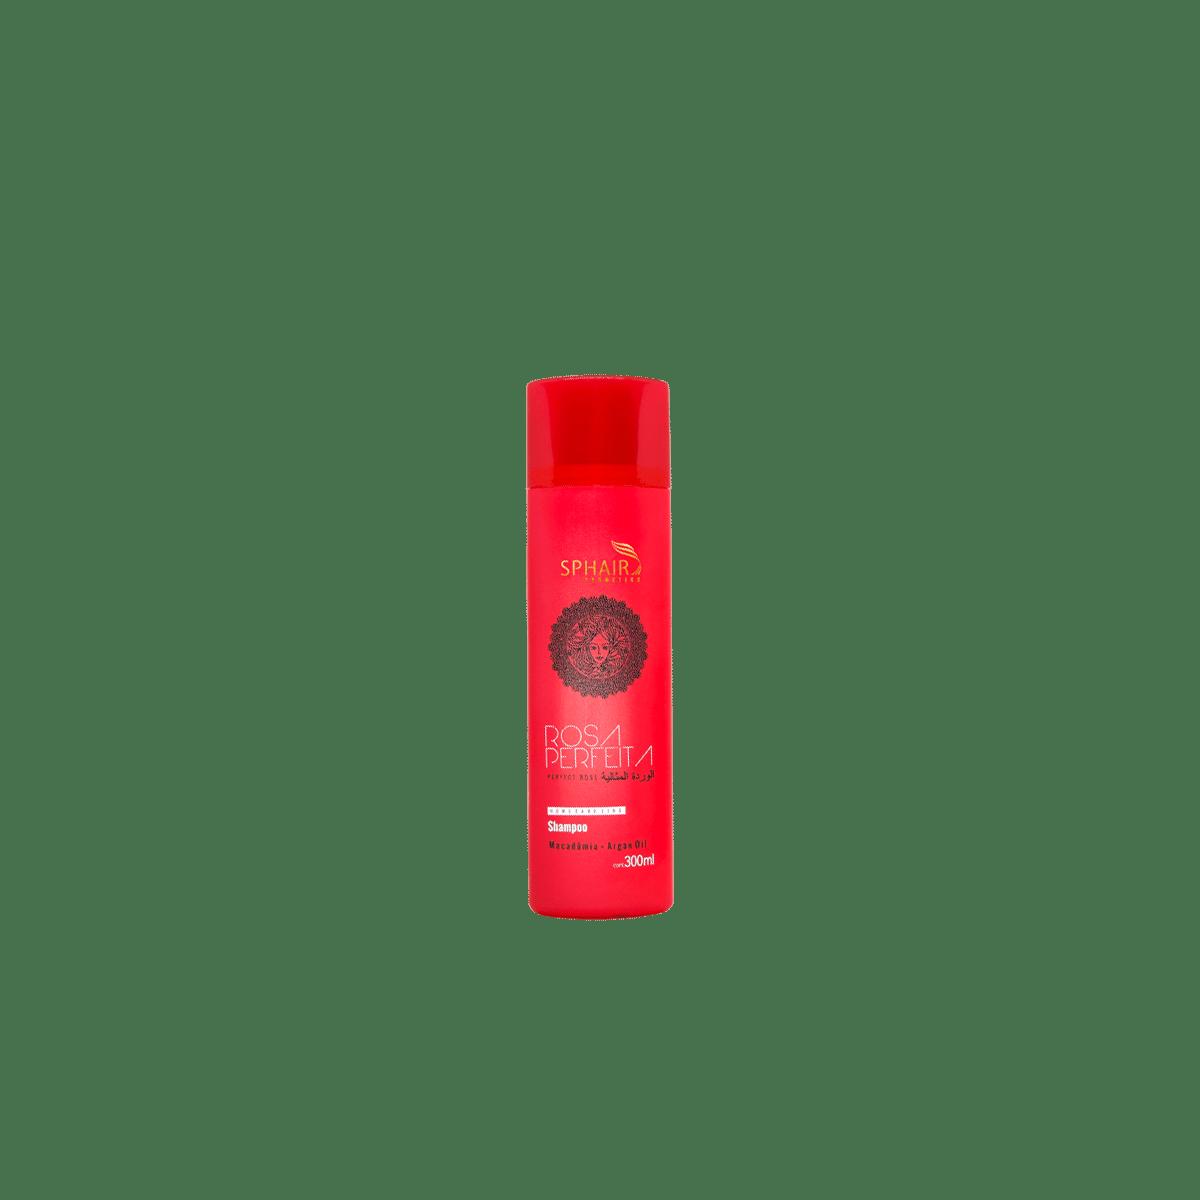 Rosa Perfeita Shampoo